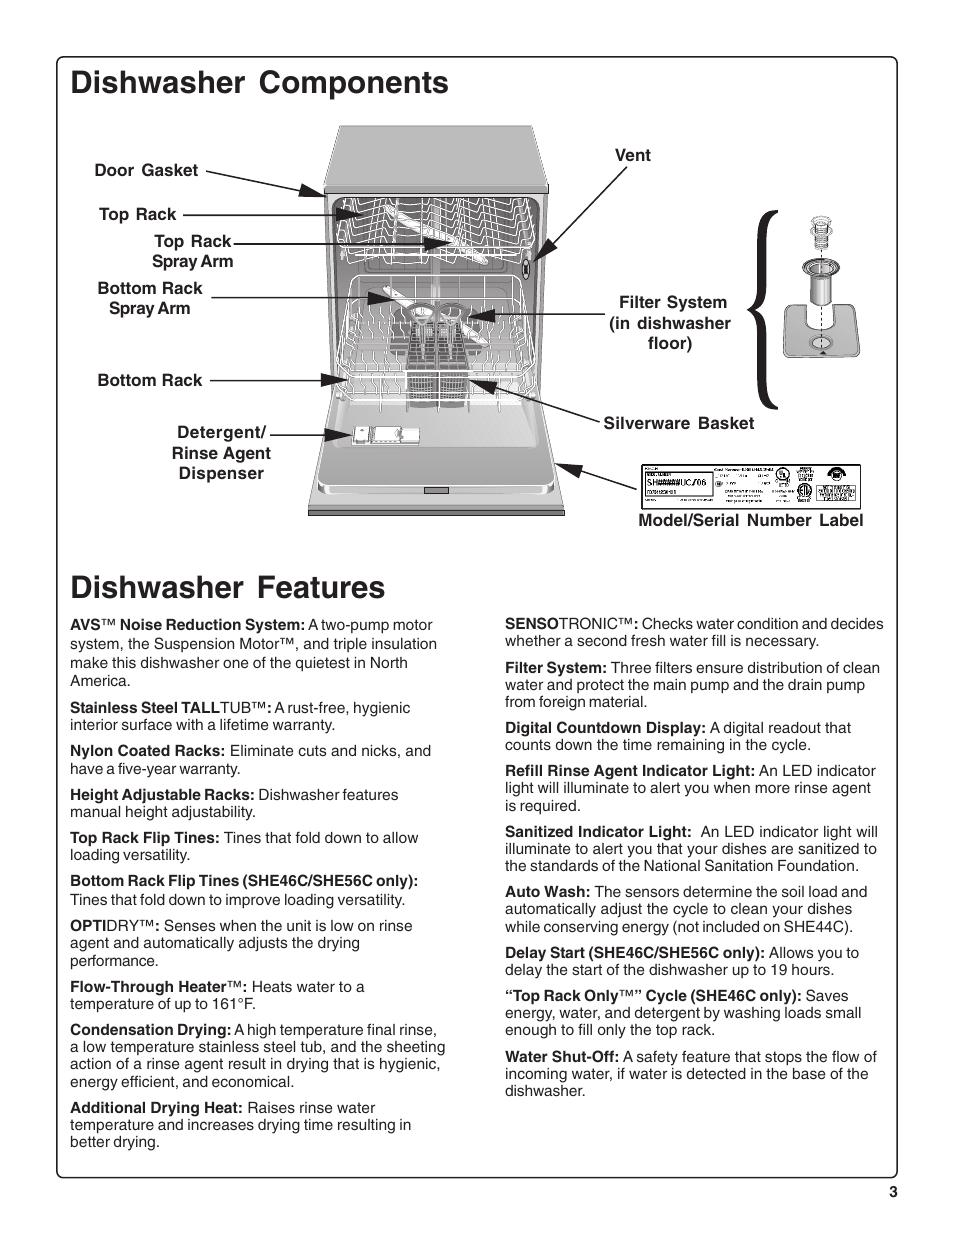 dishwasher components dishwasher features bosch she44c user rh manualsdir com Bosch 44 dBA Dishwasher Bosch Dishwasher Schematic